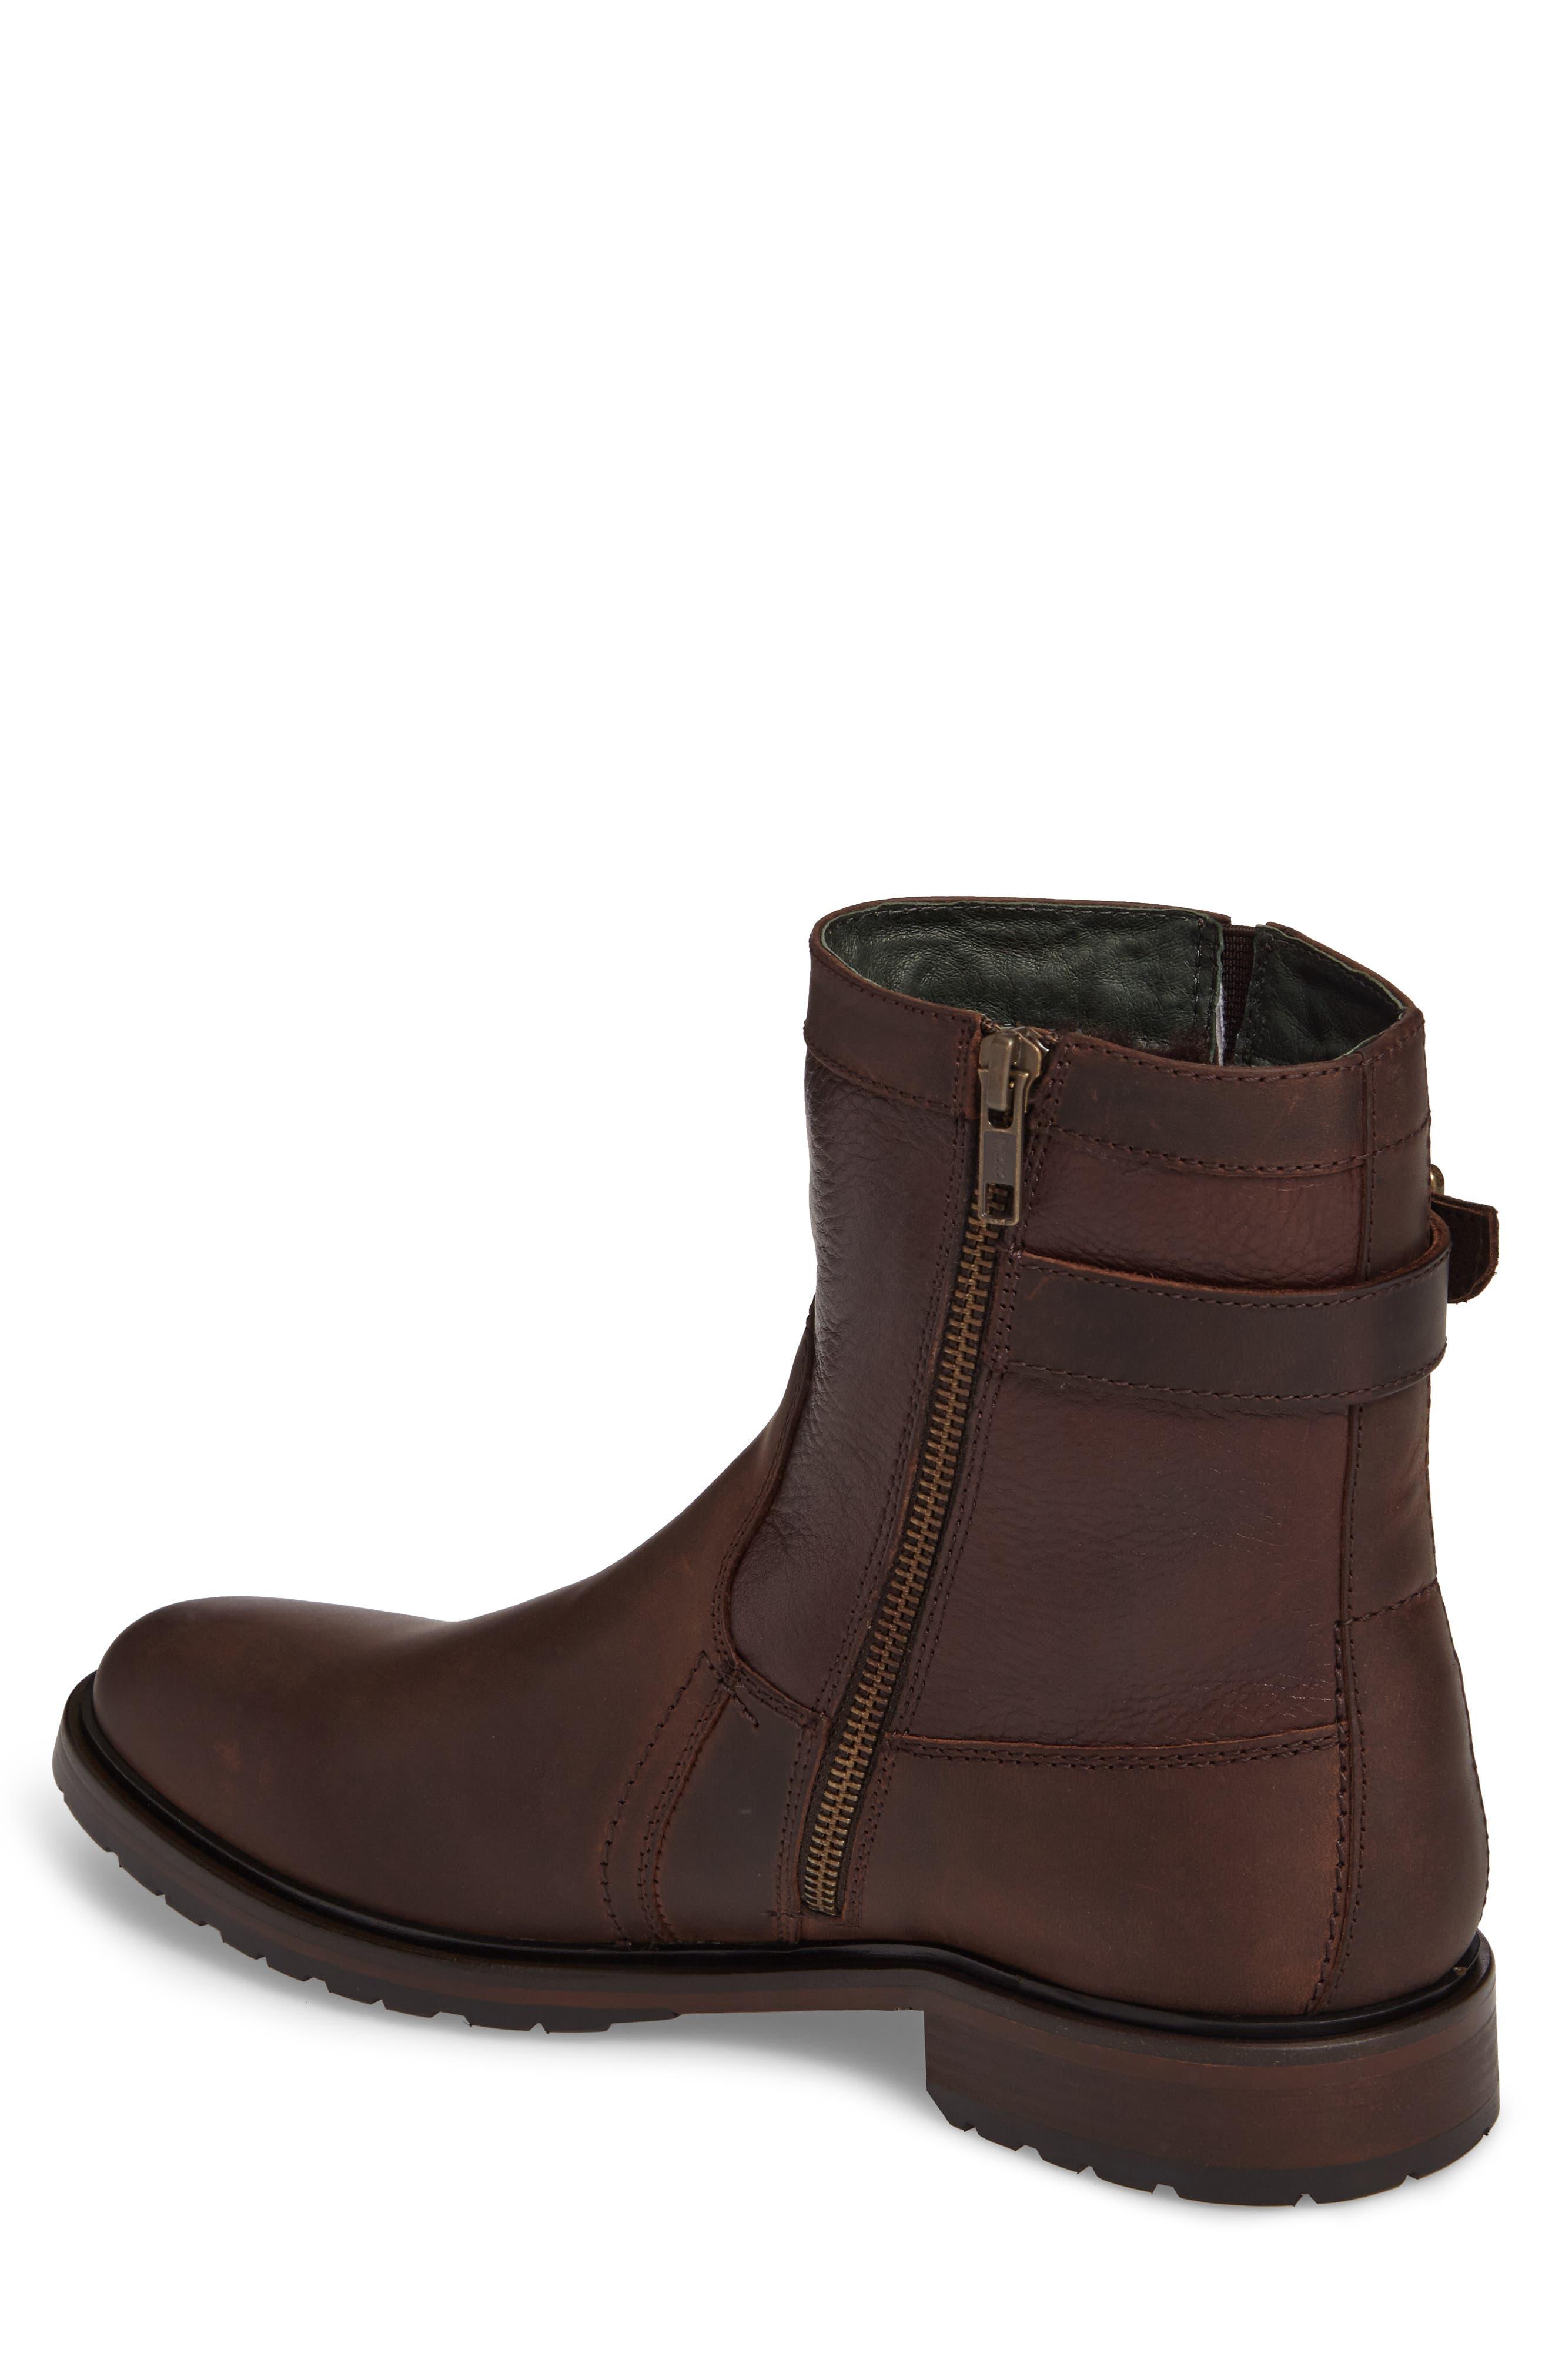 Myles Zip Boot,                             Alternate thumbnail 2, color,                             Dark Brown Leather